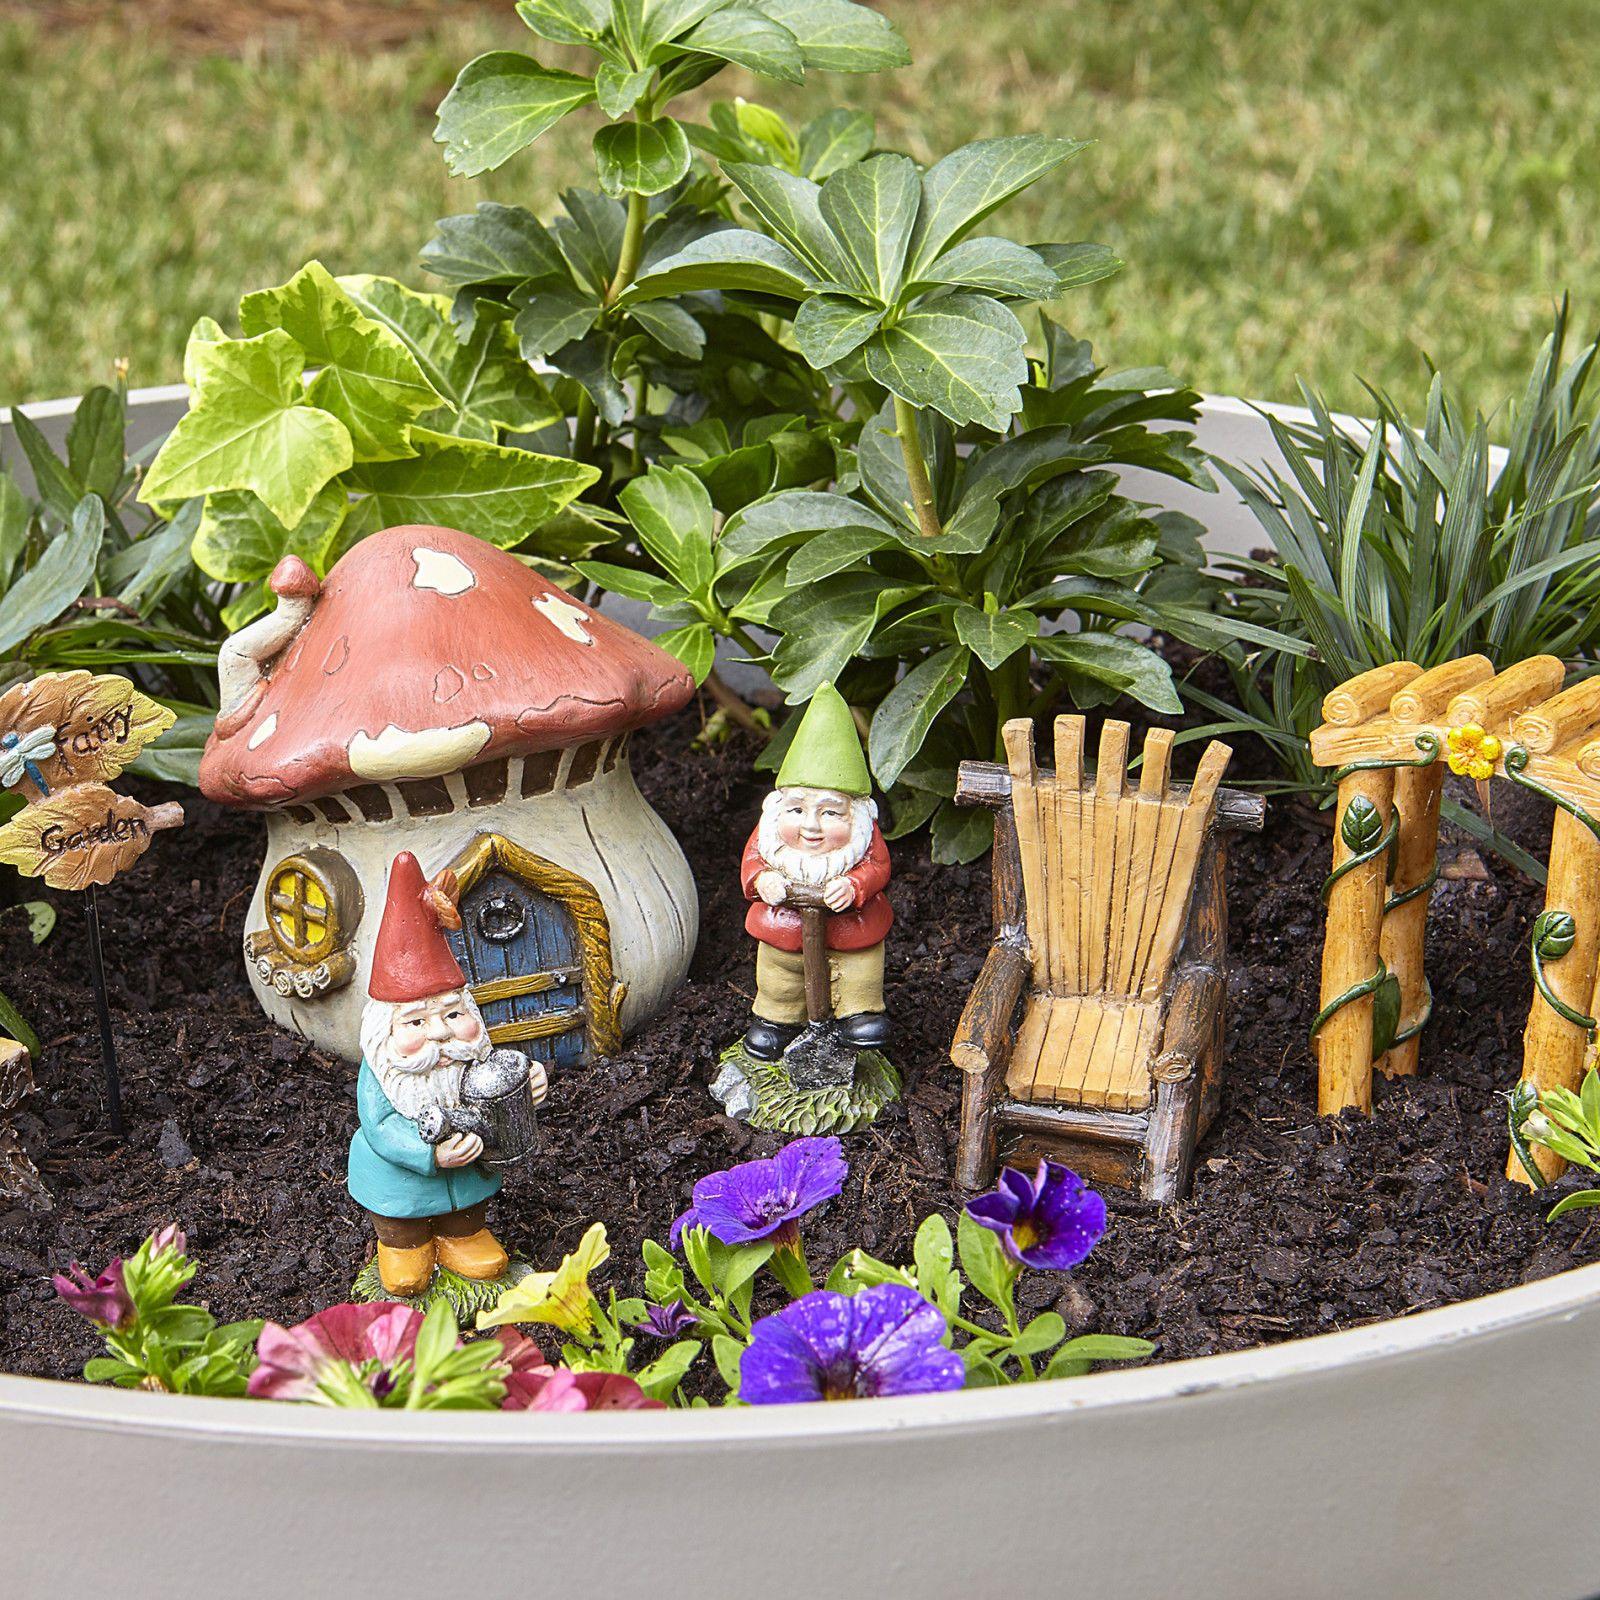 Fairy Garden gnomes miniatures Kit set for outdoor Decor Miniature ...